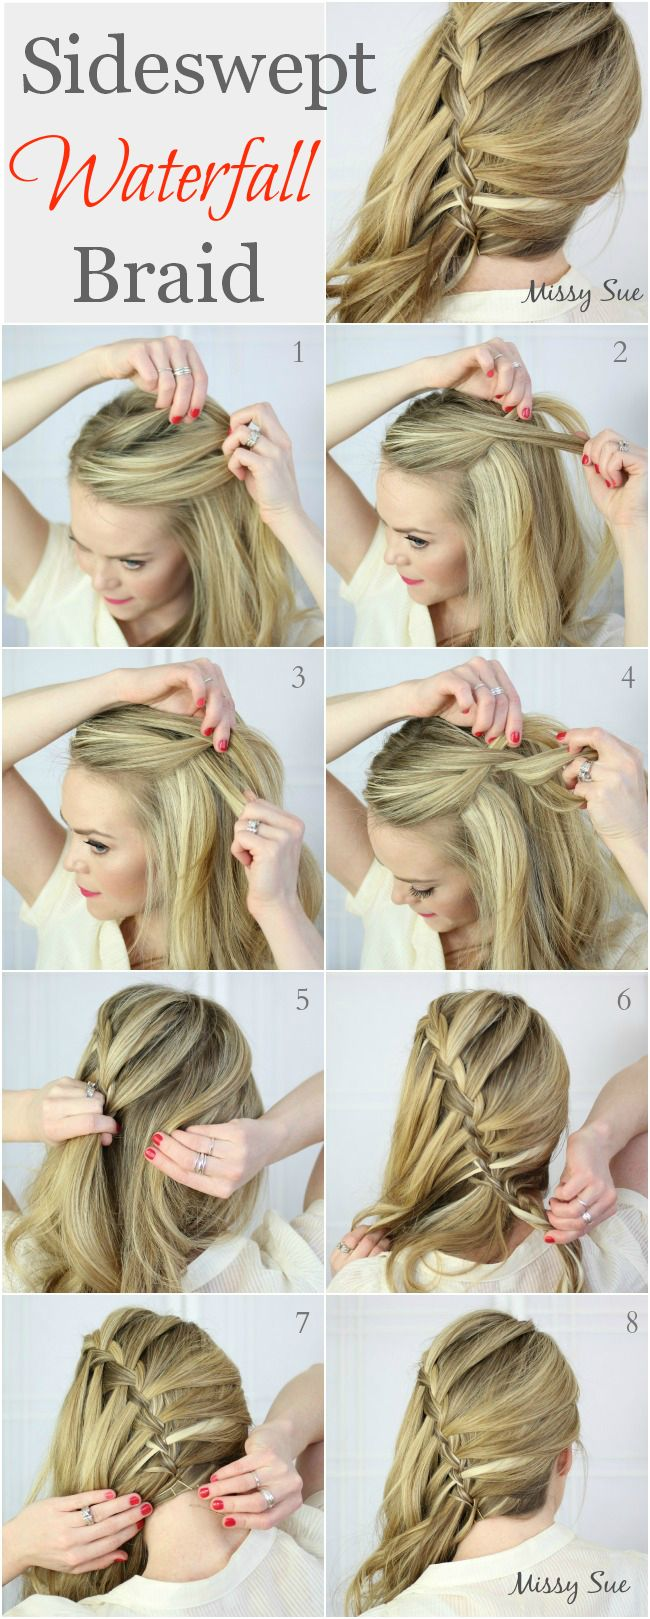 Miraculous 1000 Ideas About Waterfall Braids On Pinterest Braids Fishtail Hairstyle Inspiration Daily Dogsangcom